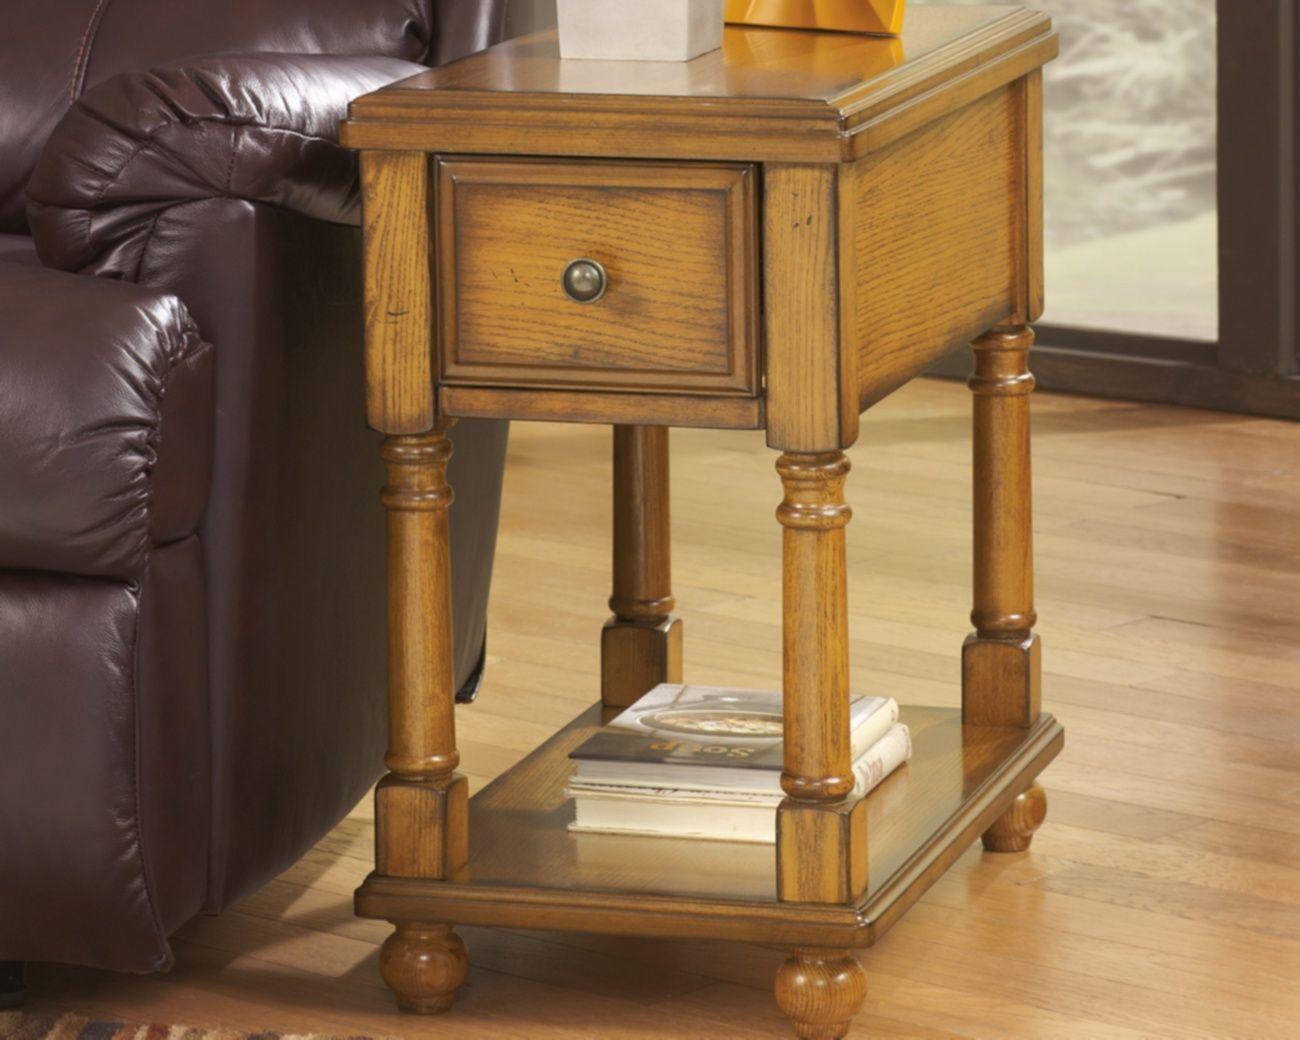 signature design breegin chair side end table - ashley furniture t007-430